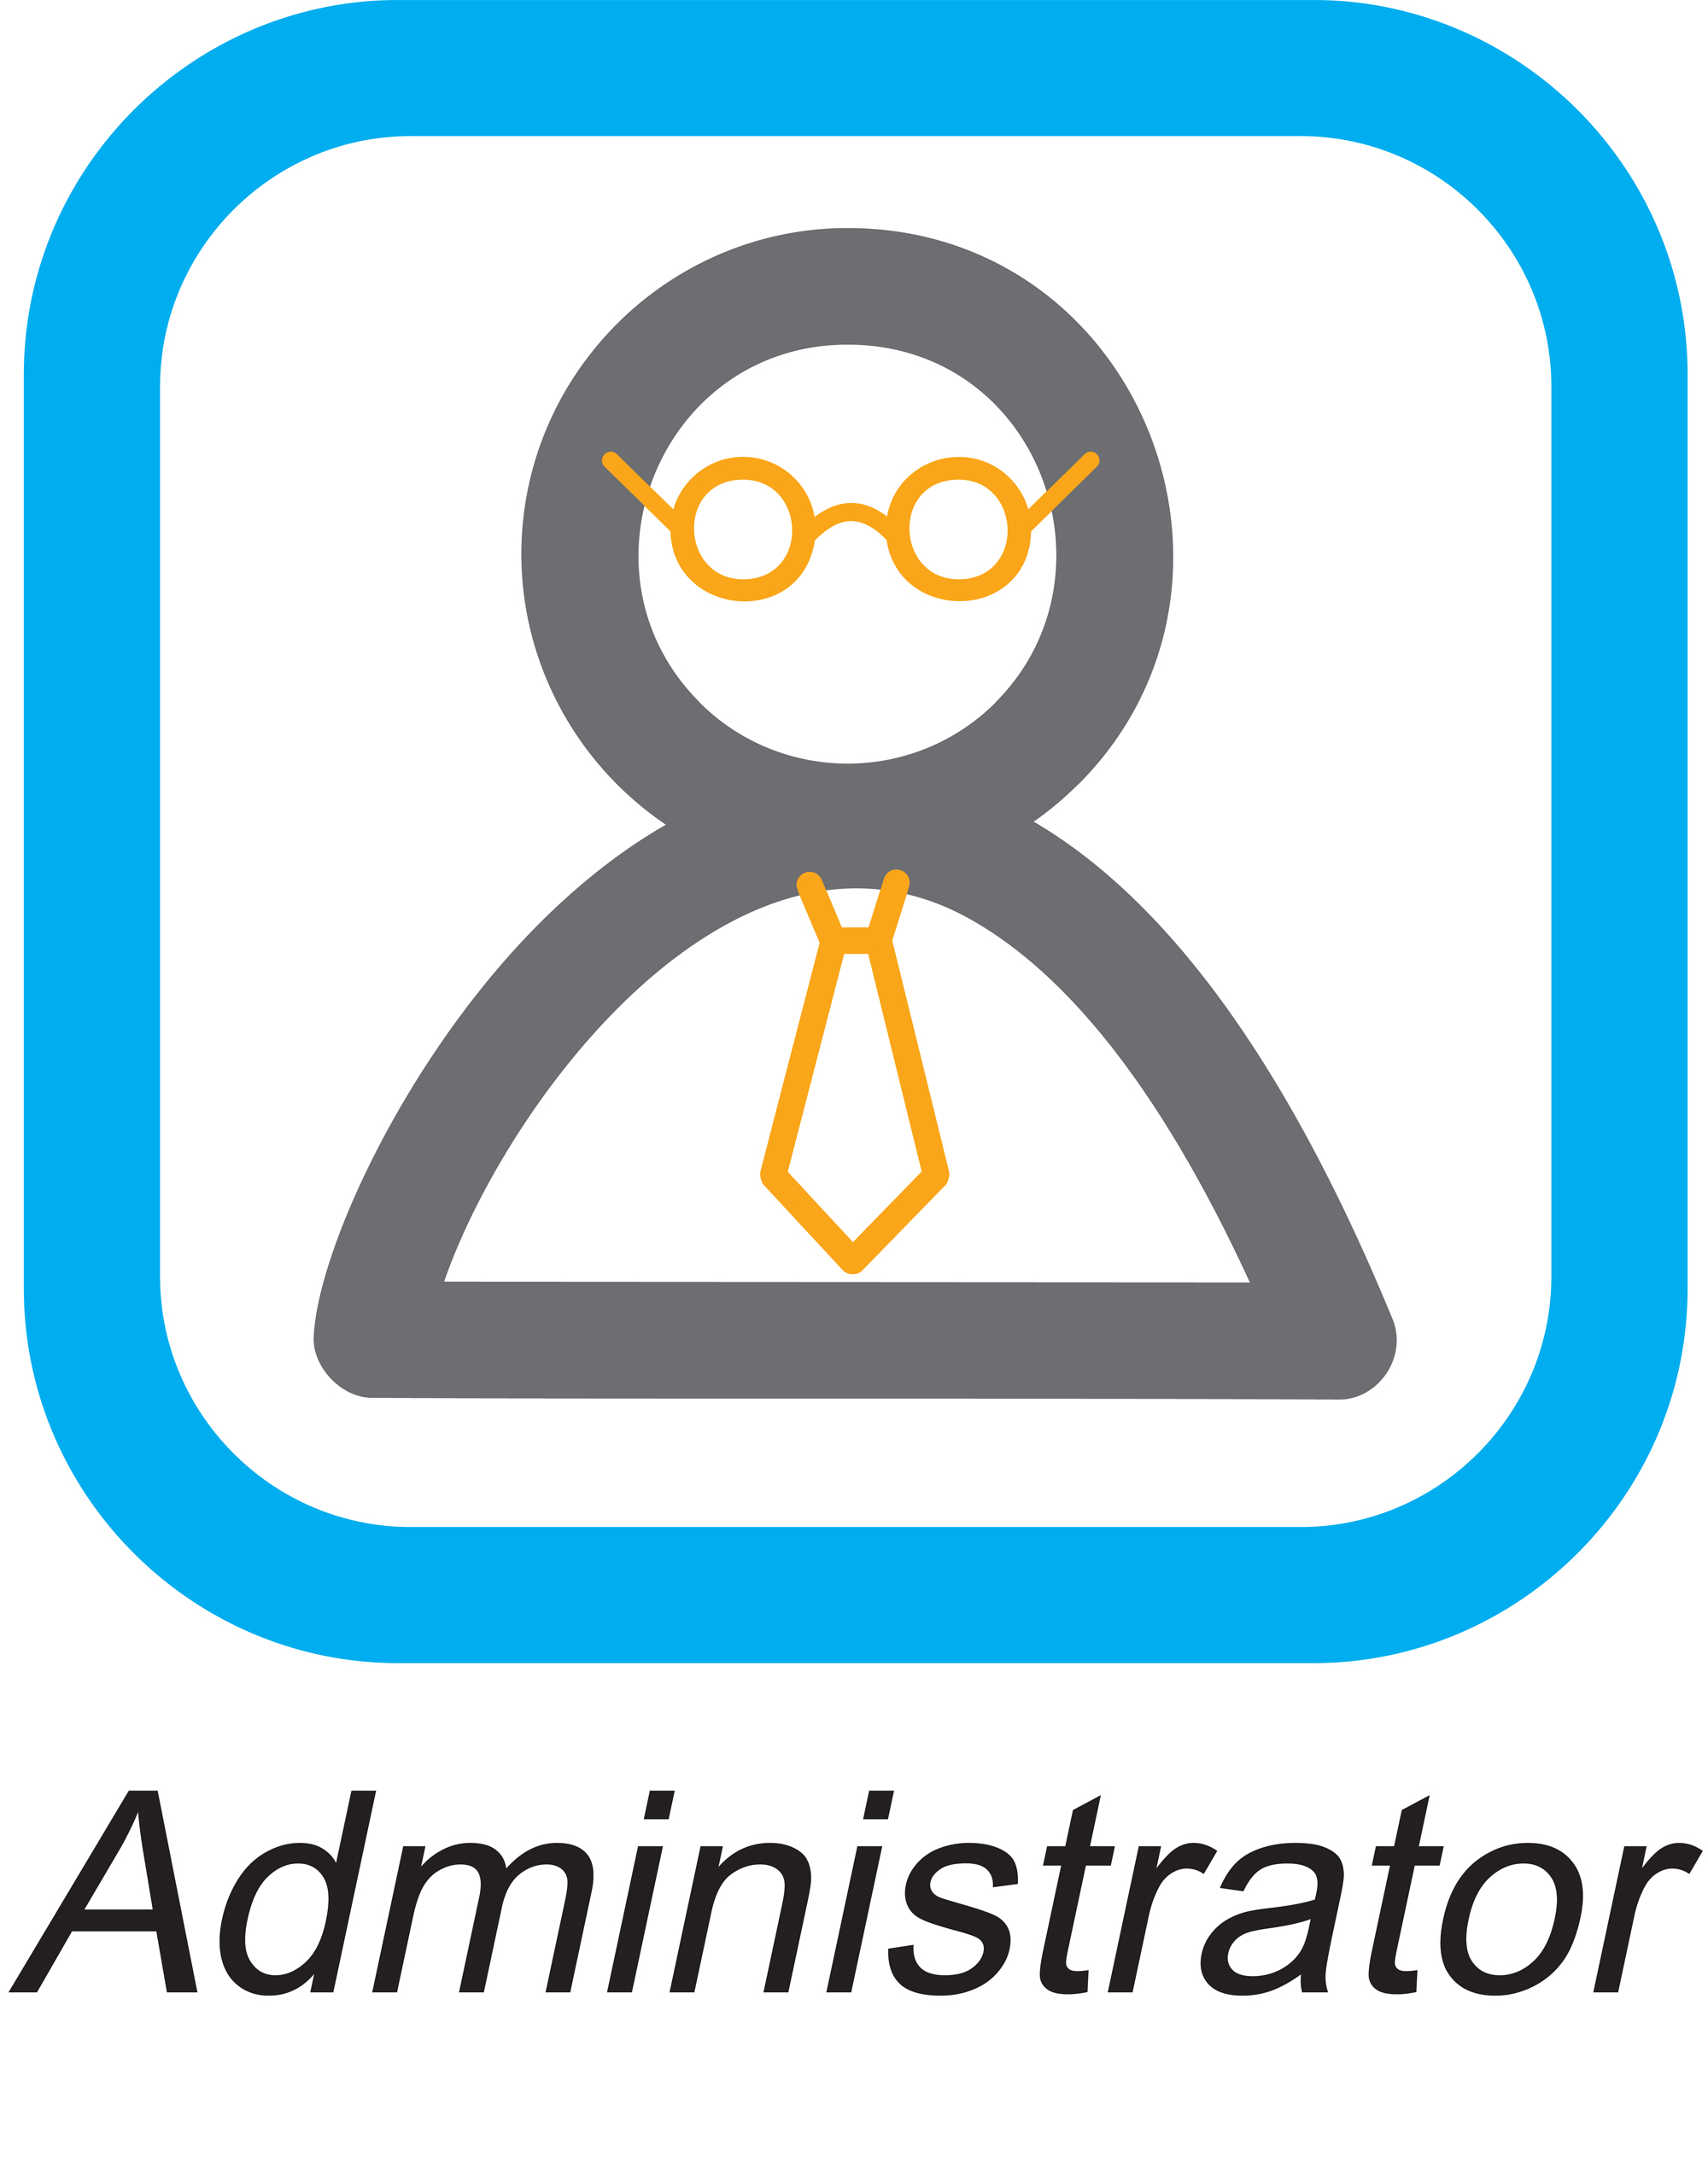 Administrator Jobs in Saudi Arabia